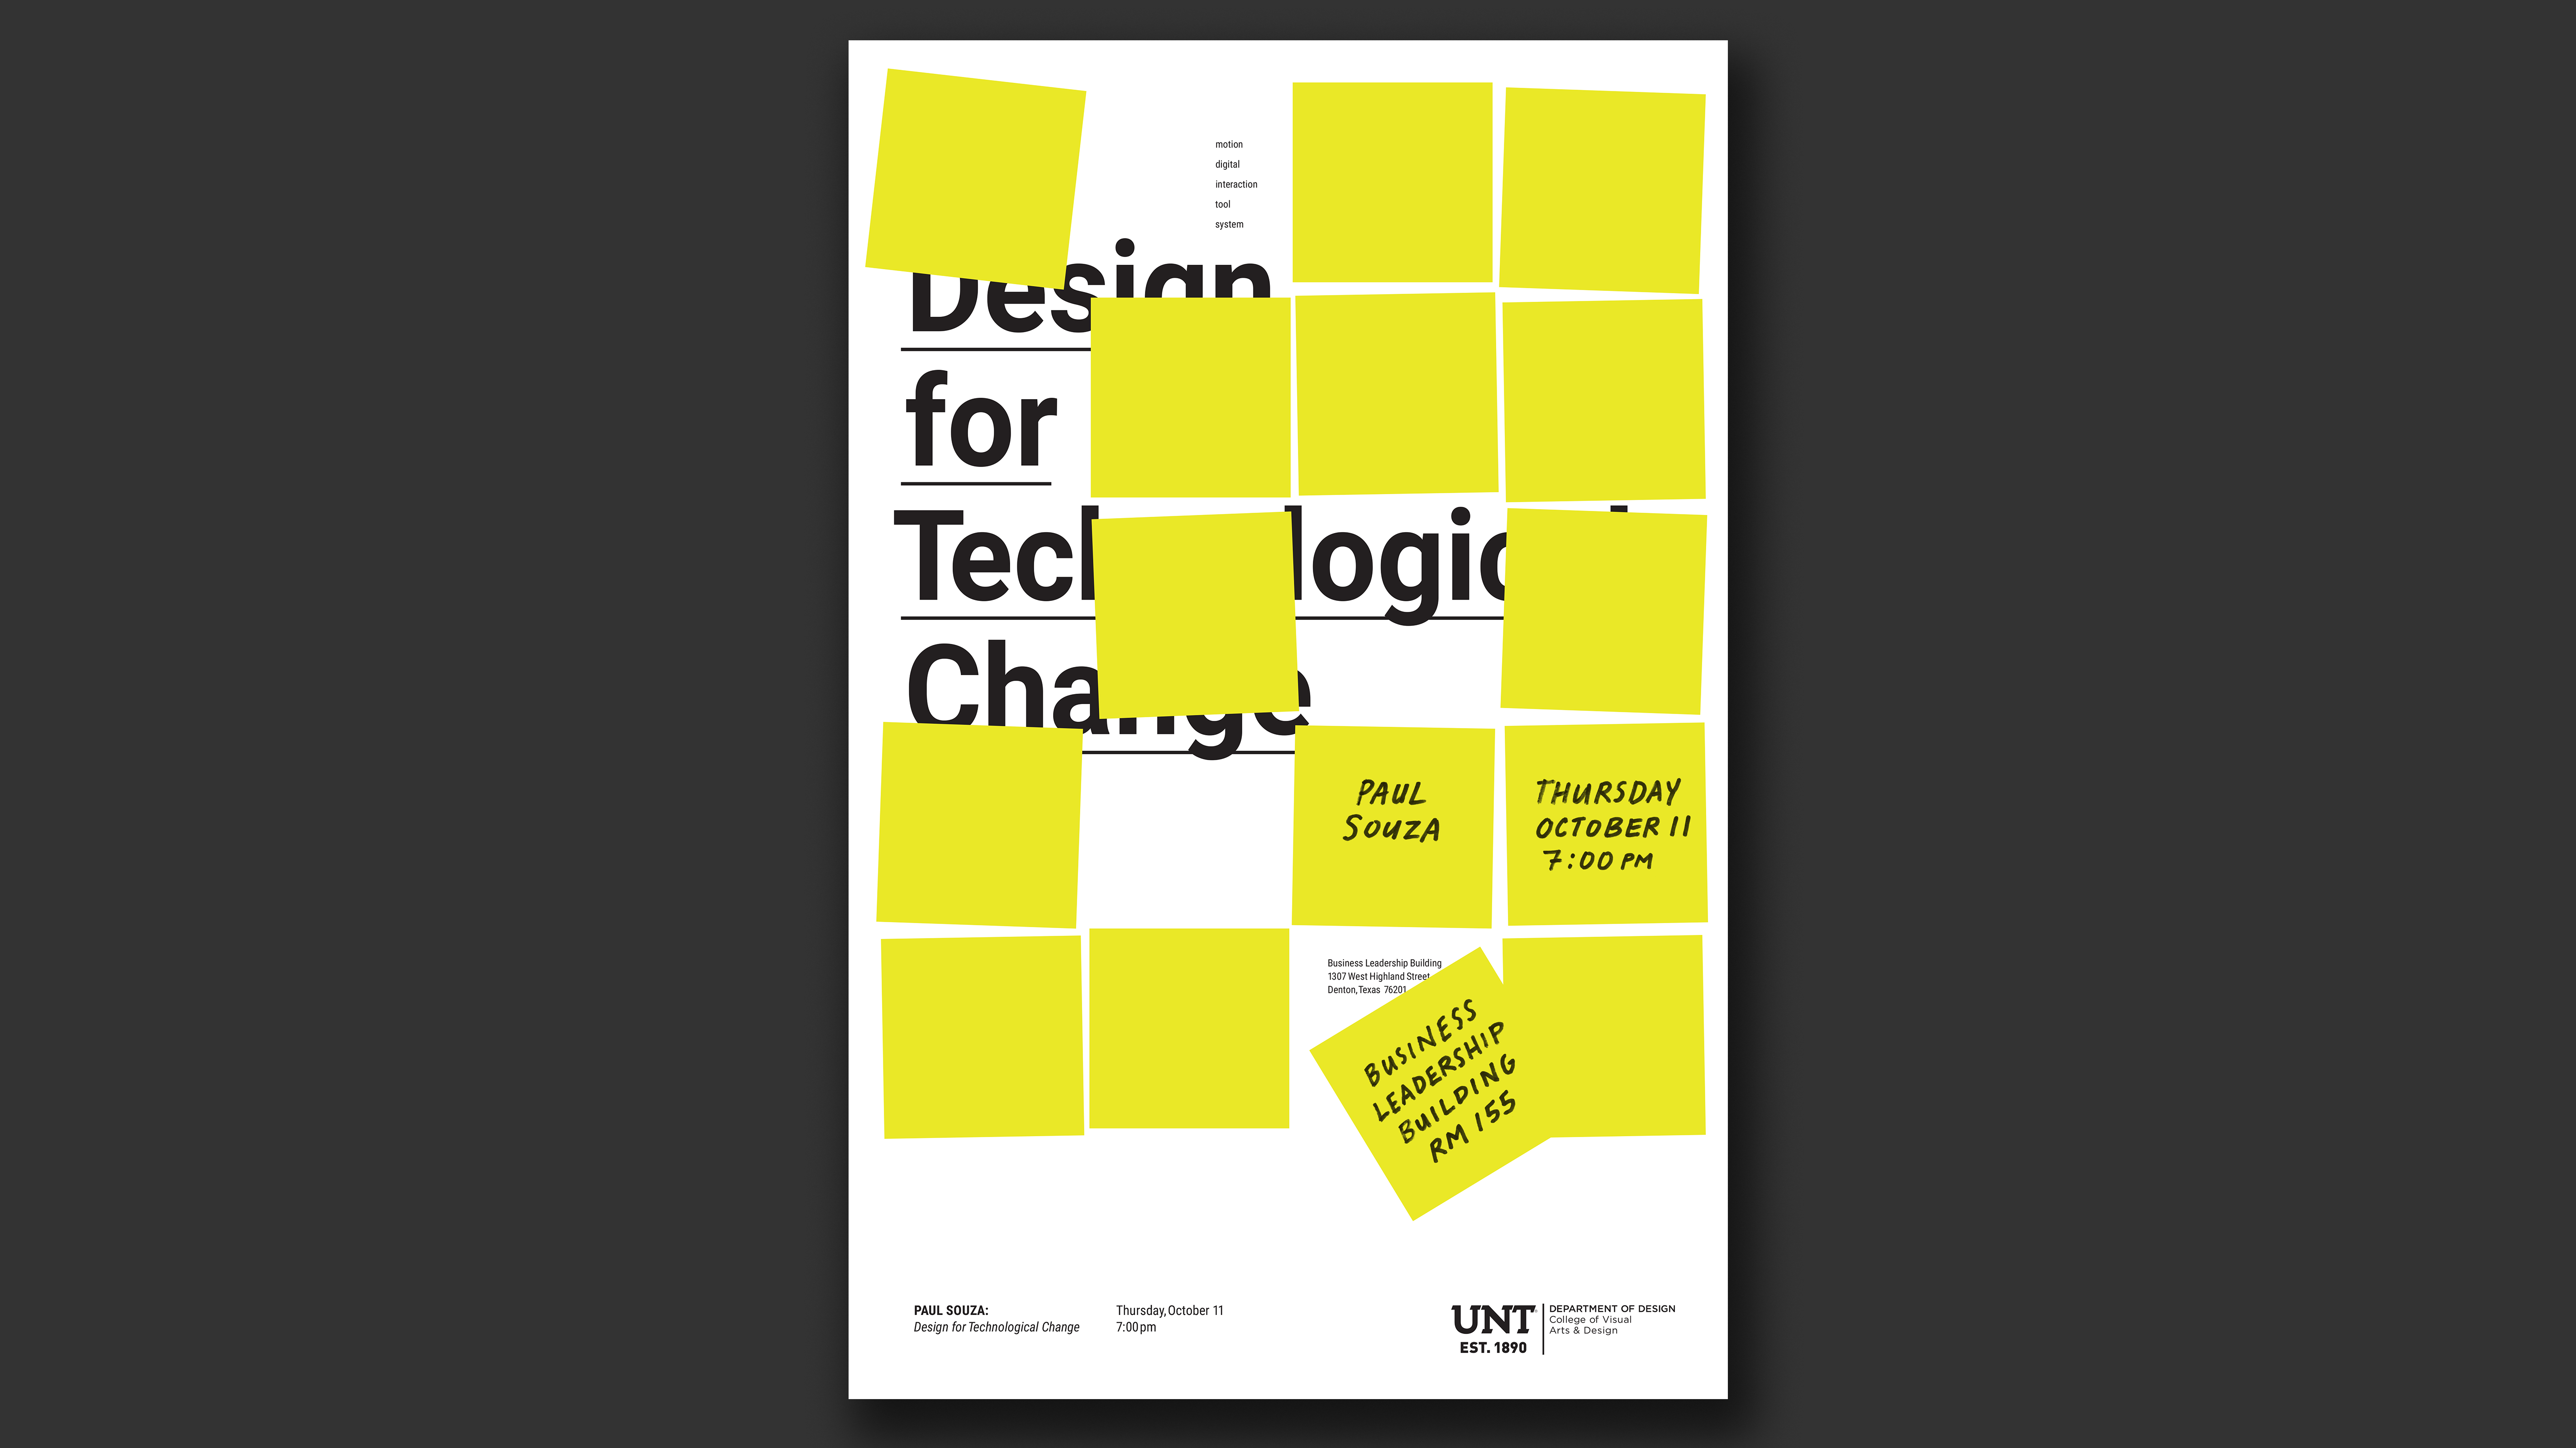 Paul Souza: Design for Technological Change